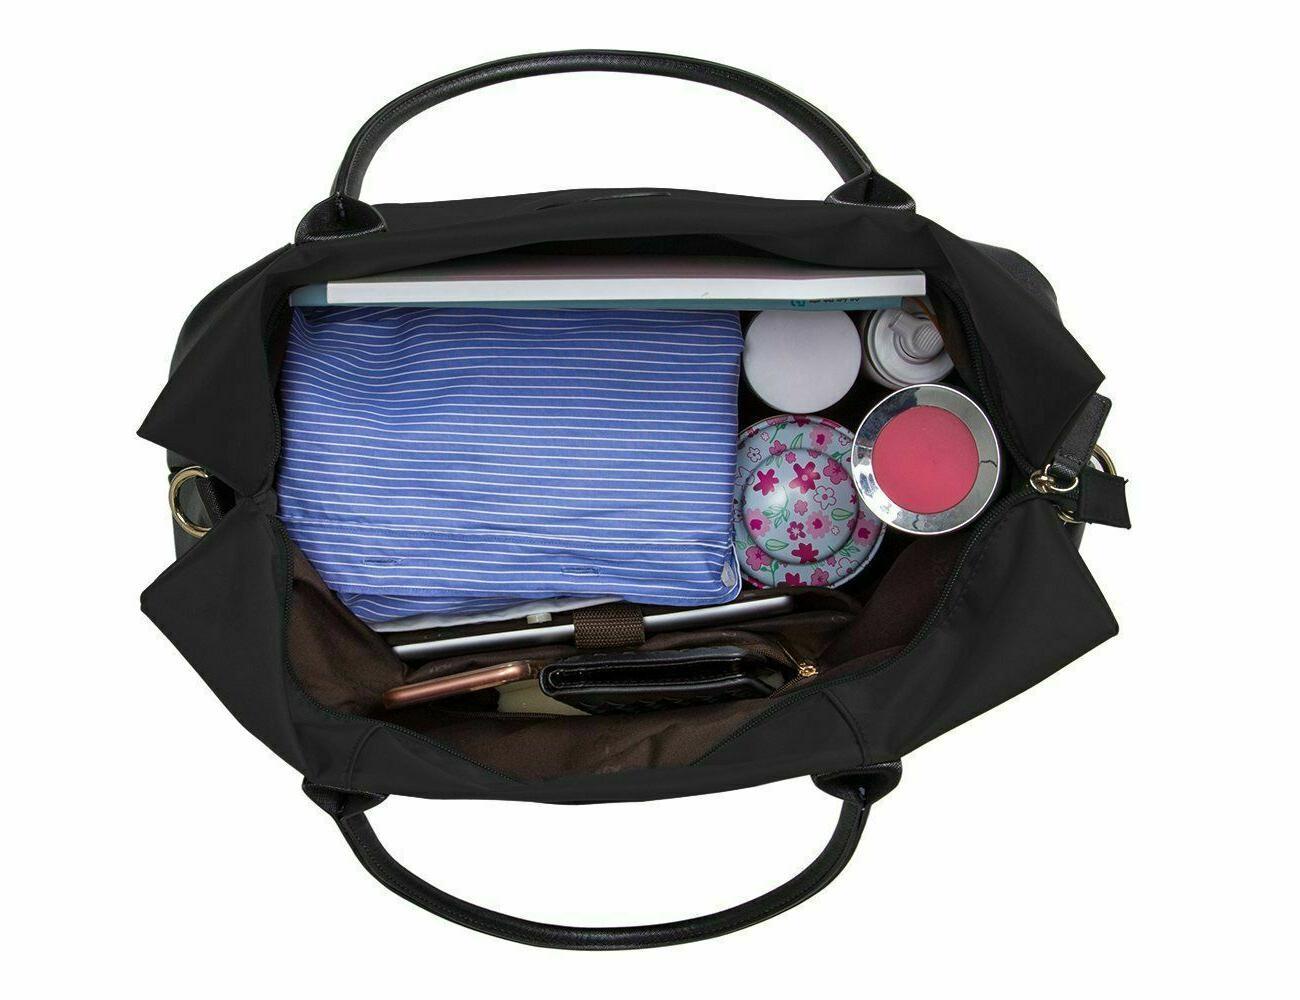 ECOSUSI Unisex Weekender Bag Duffel Gym Totes Handle